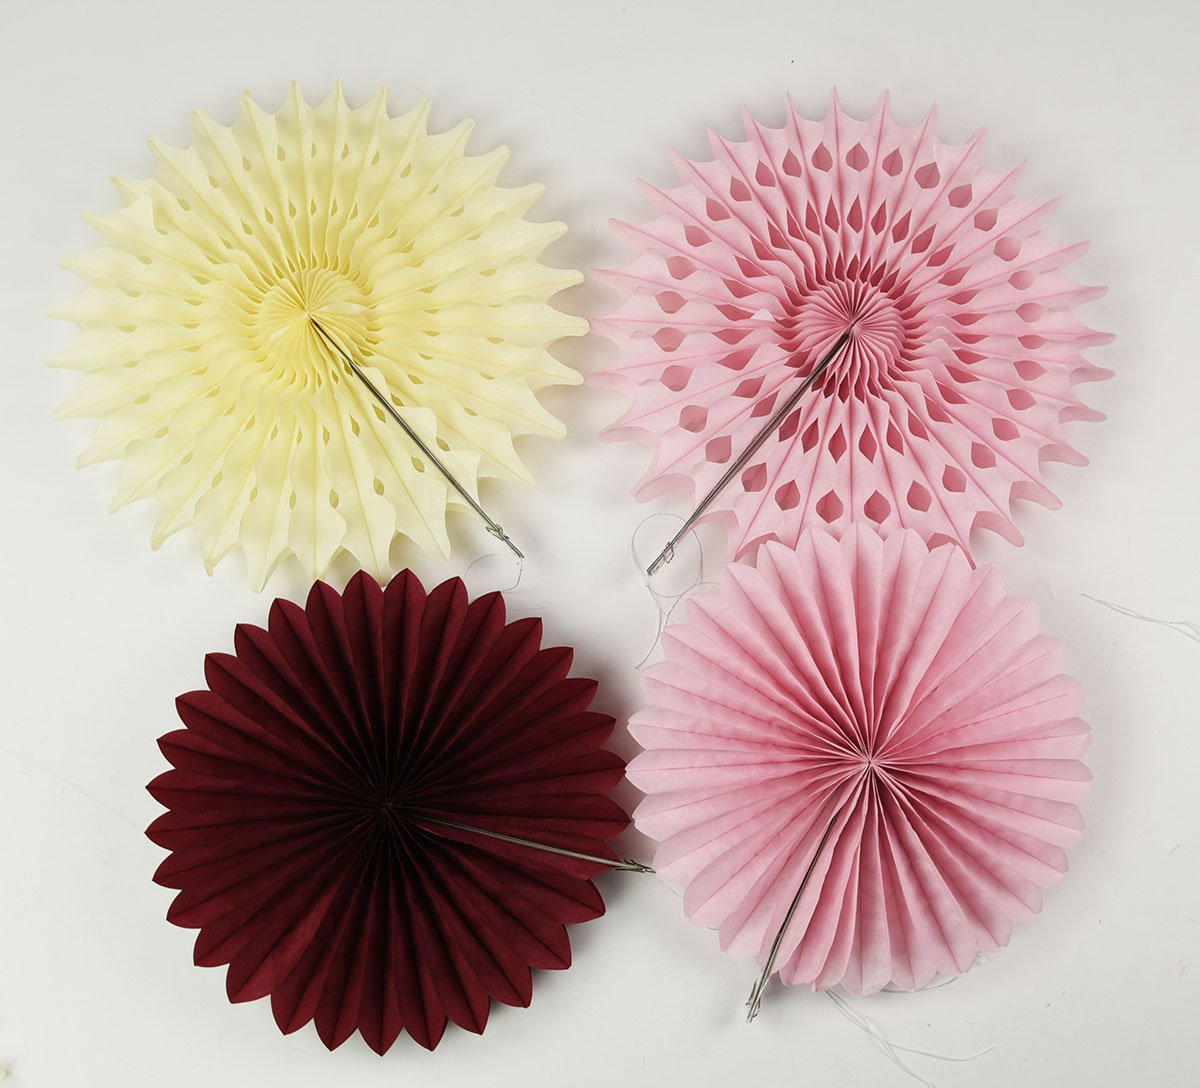 Amazon.com: Burgundy Pink Bridal Shower Decorations Pinwheels Paper ...